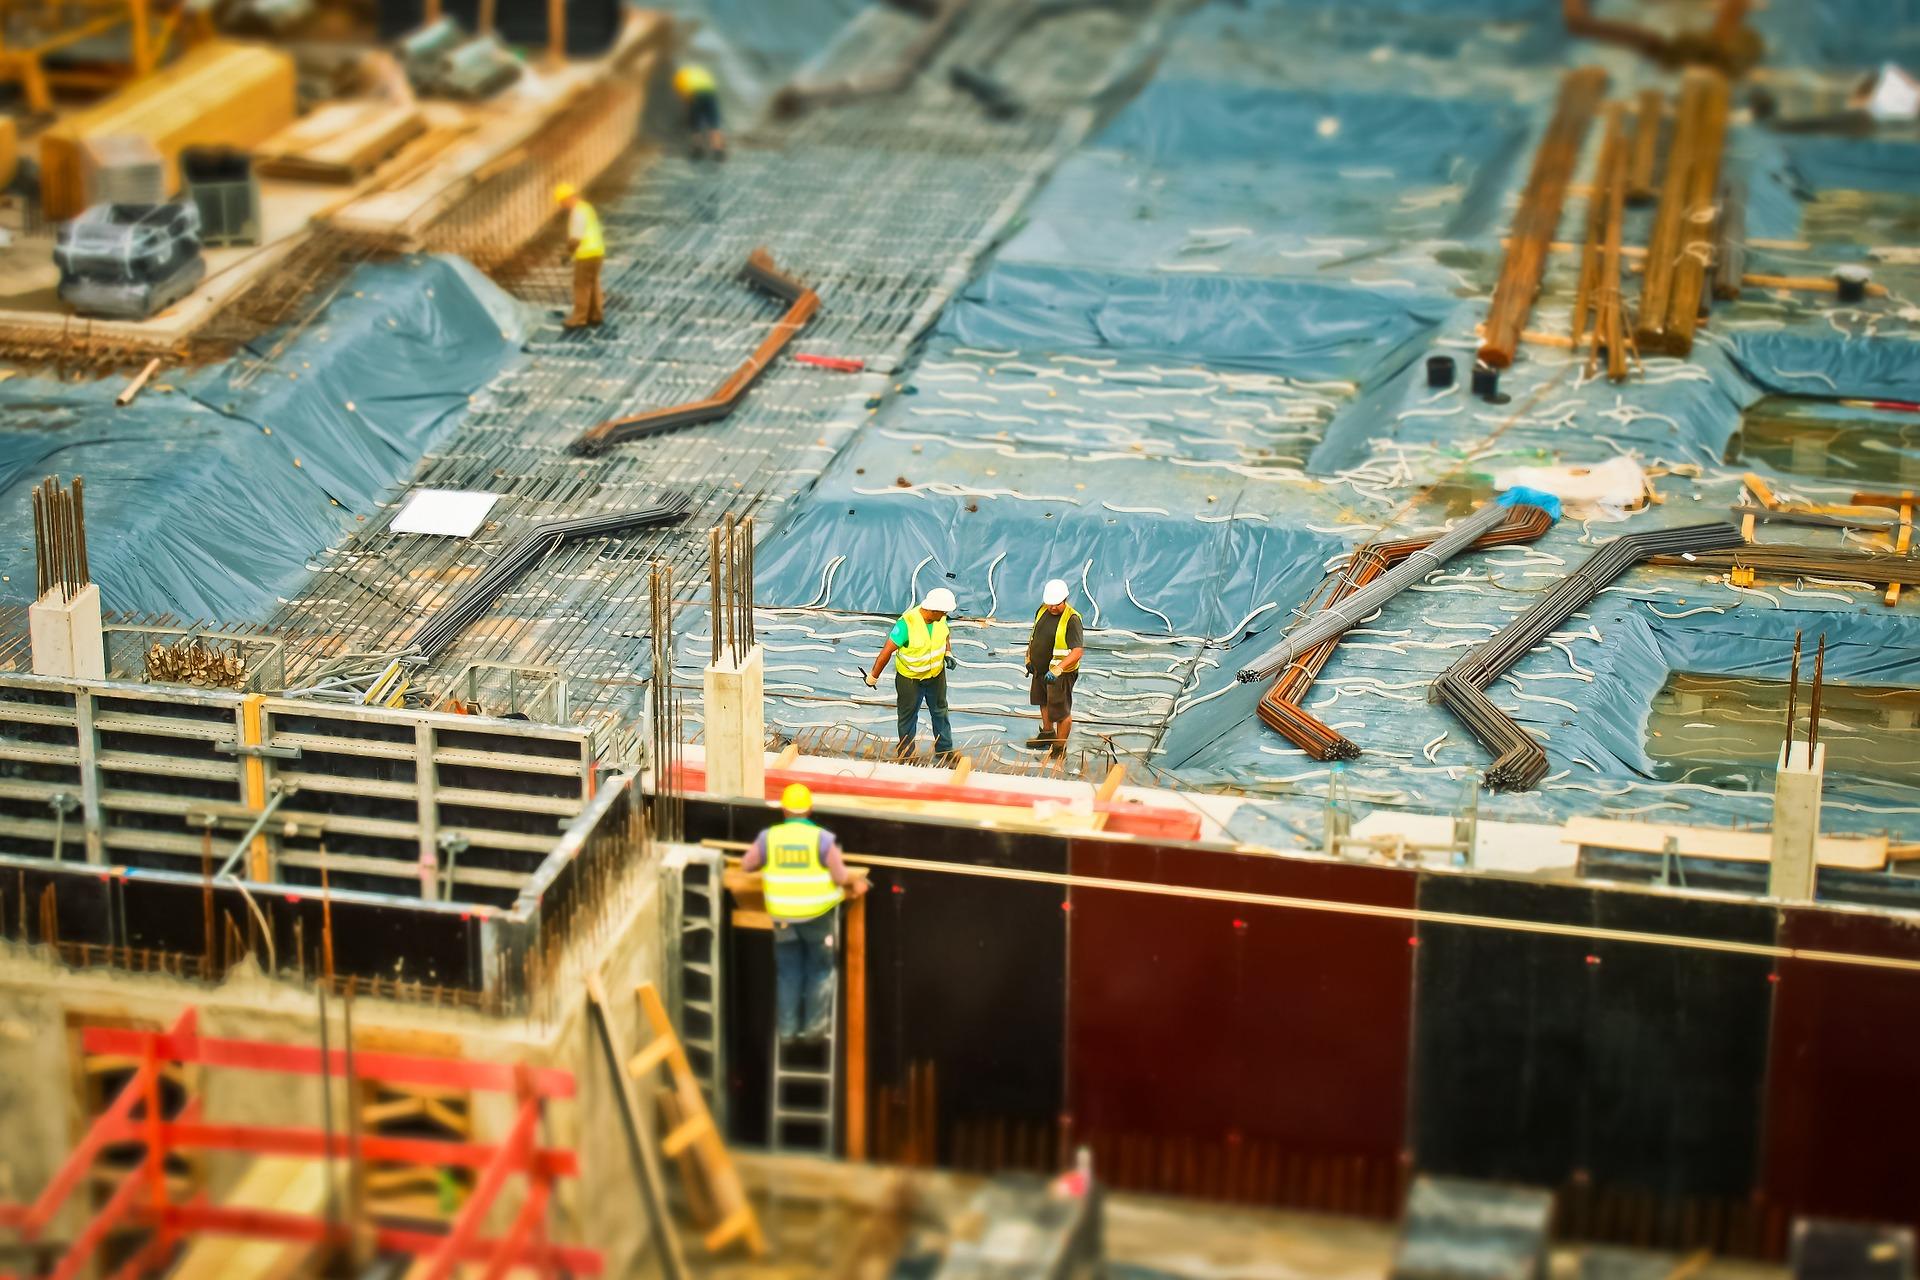 Construction work photo